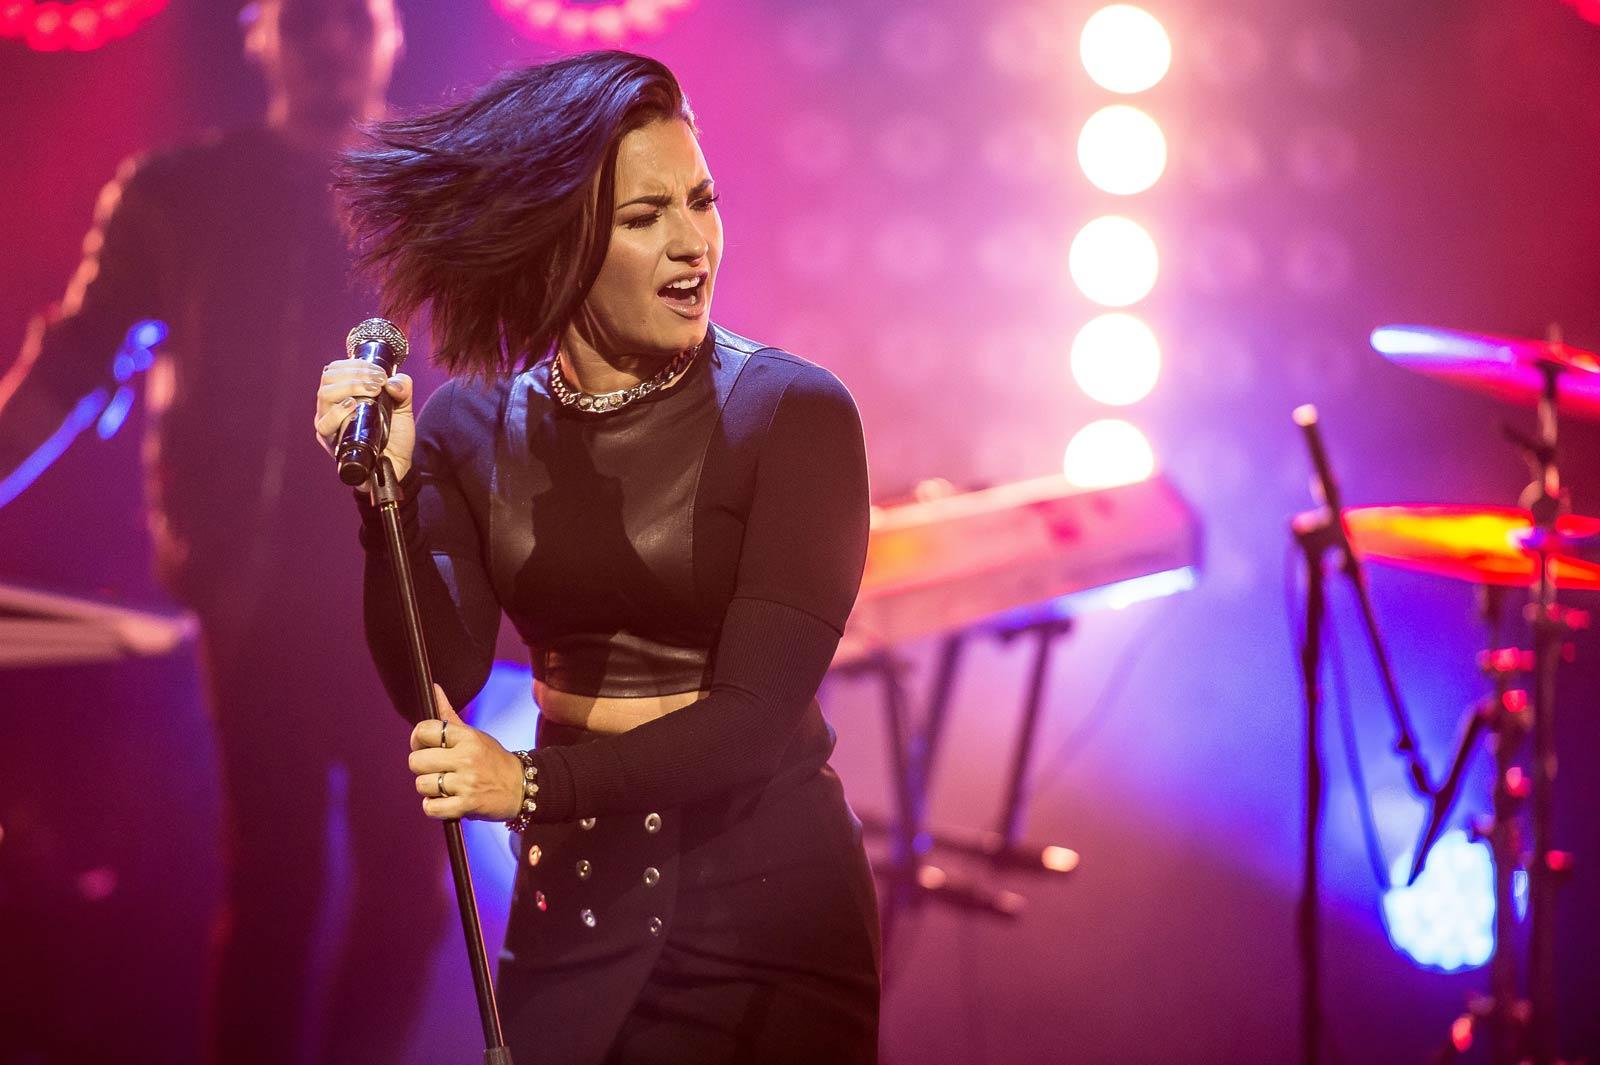 Demi Lovato Photo Gallery >> Gallery - Leather Celebrities